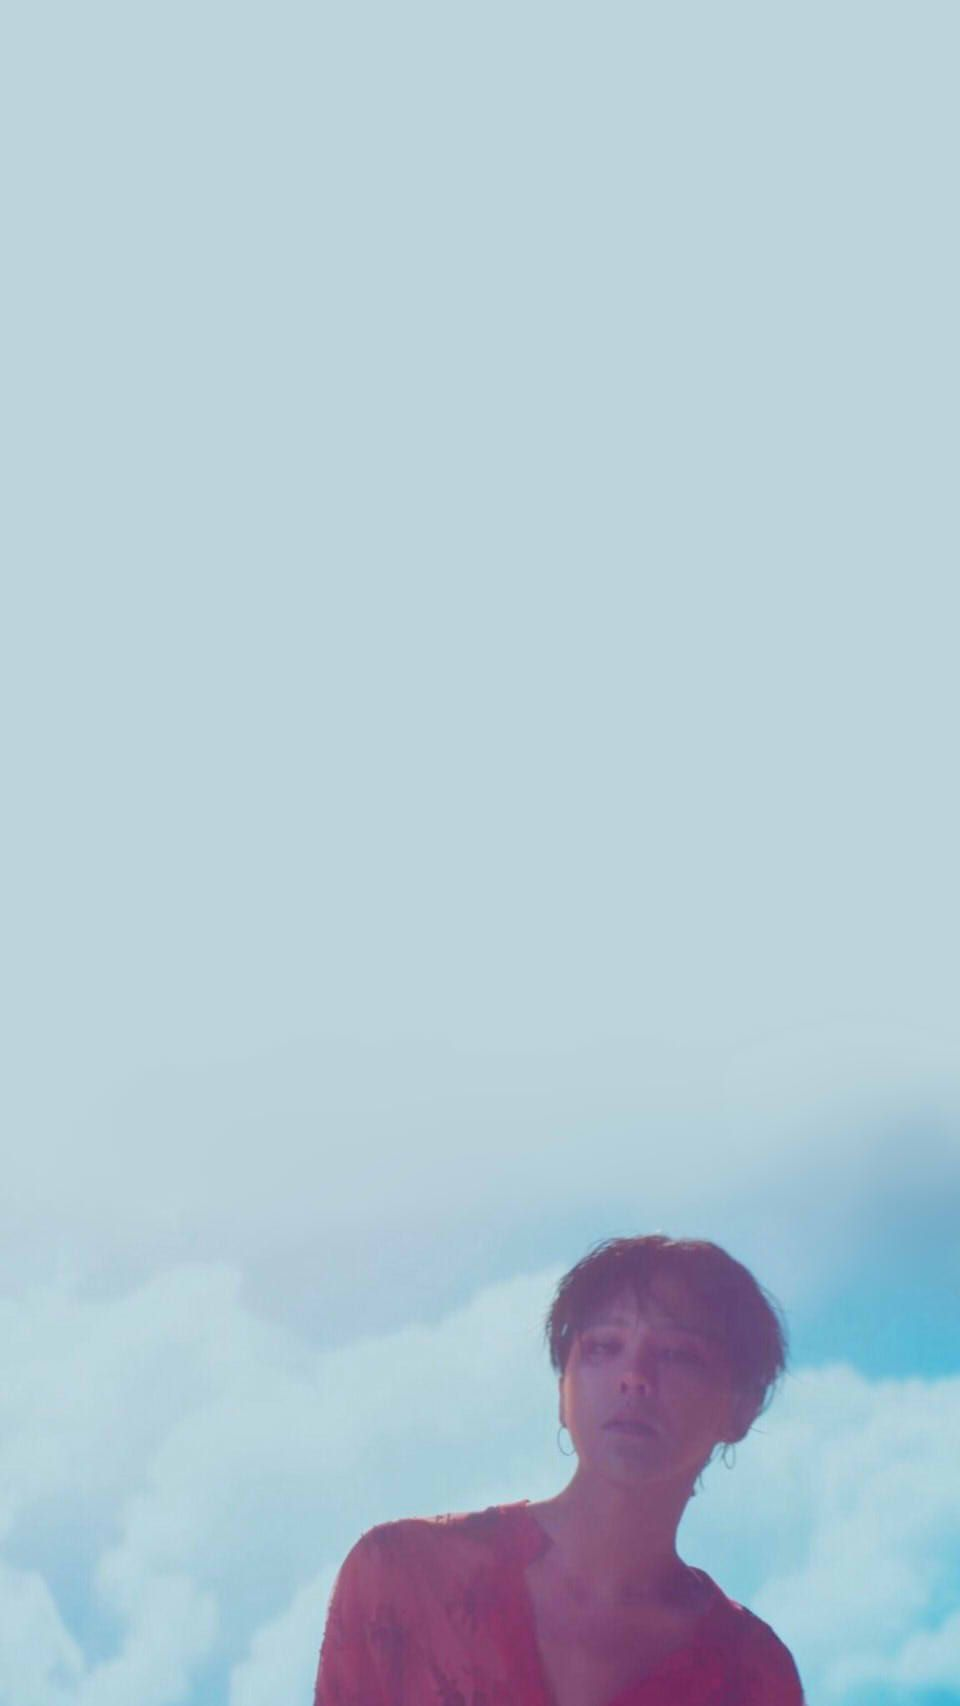 [G-DRAGON - '권지용 (KWON JI YONG)'] #GDRAGON #GD #권지용 #KWONJIYONG #NEWALBUM #RELEASE #YG